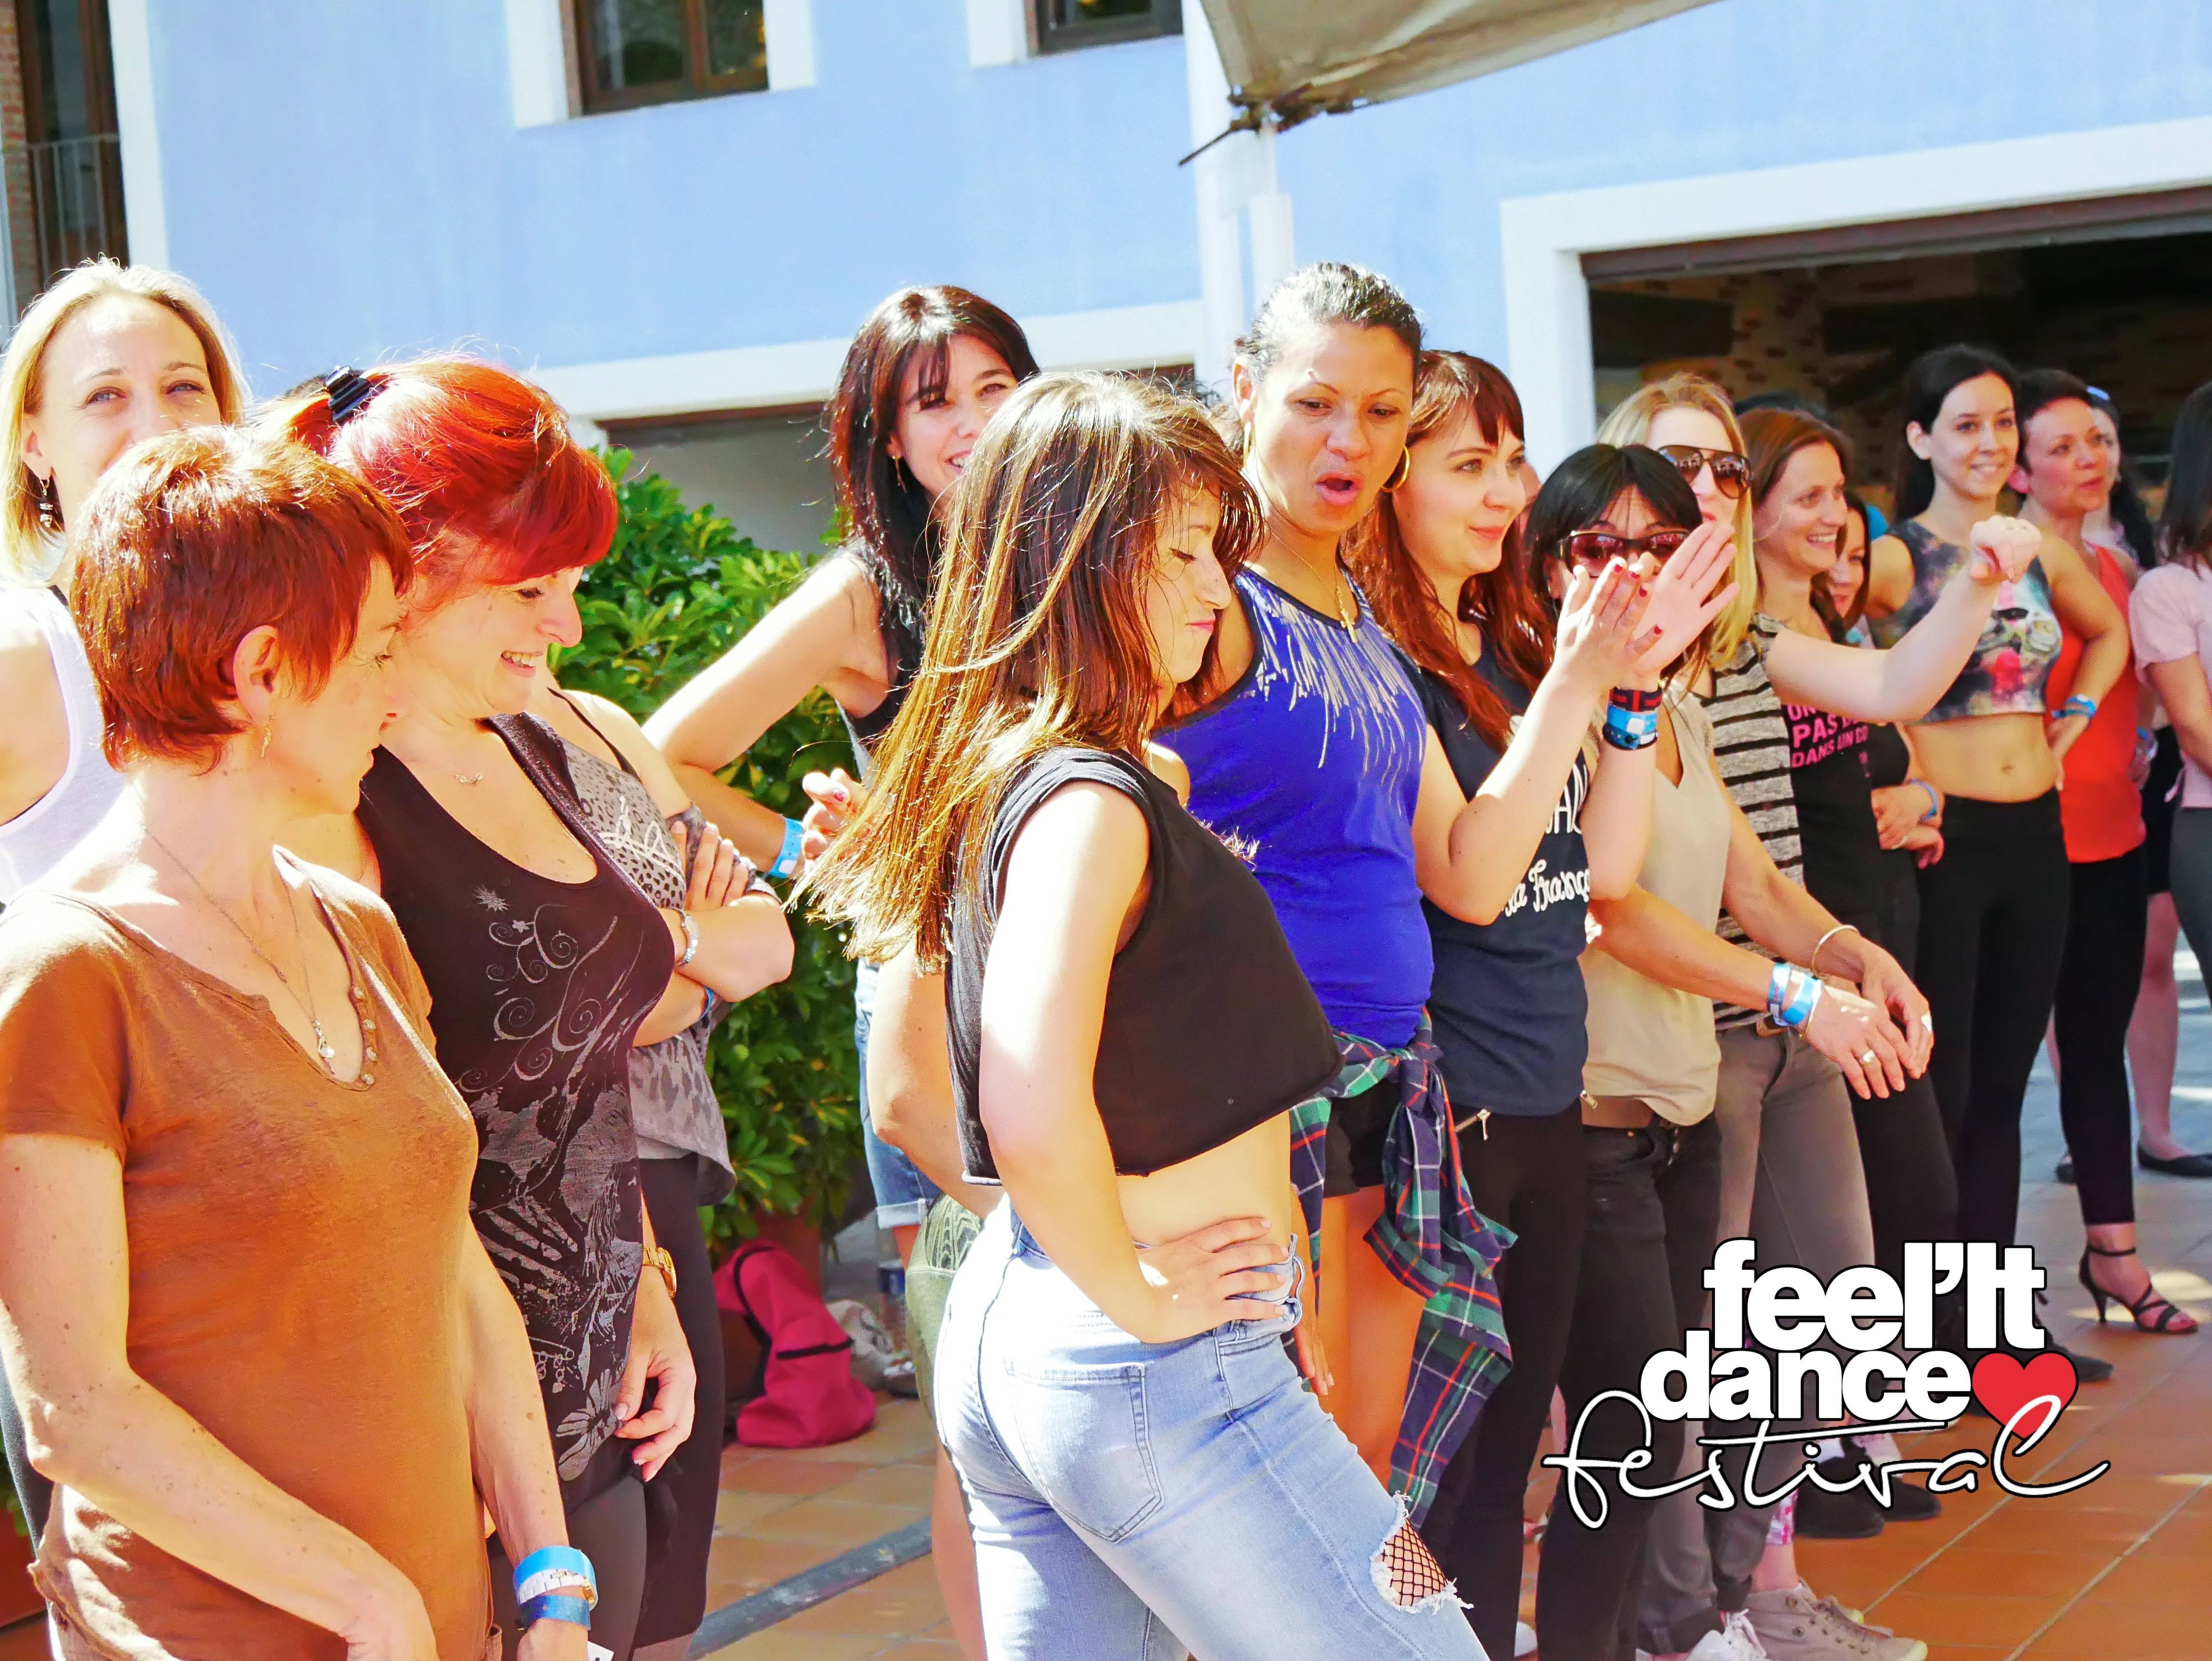 FeelitDanceFestival - 153